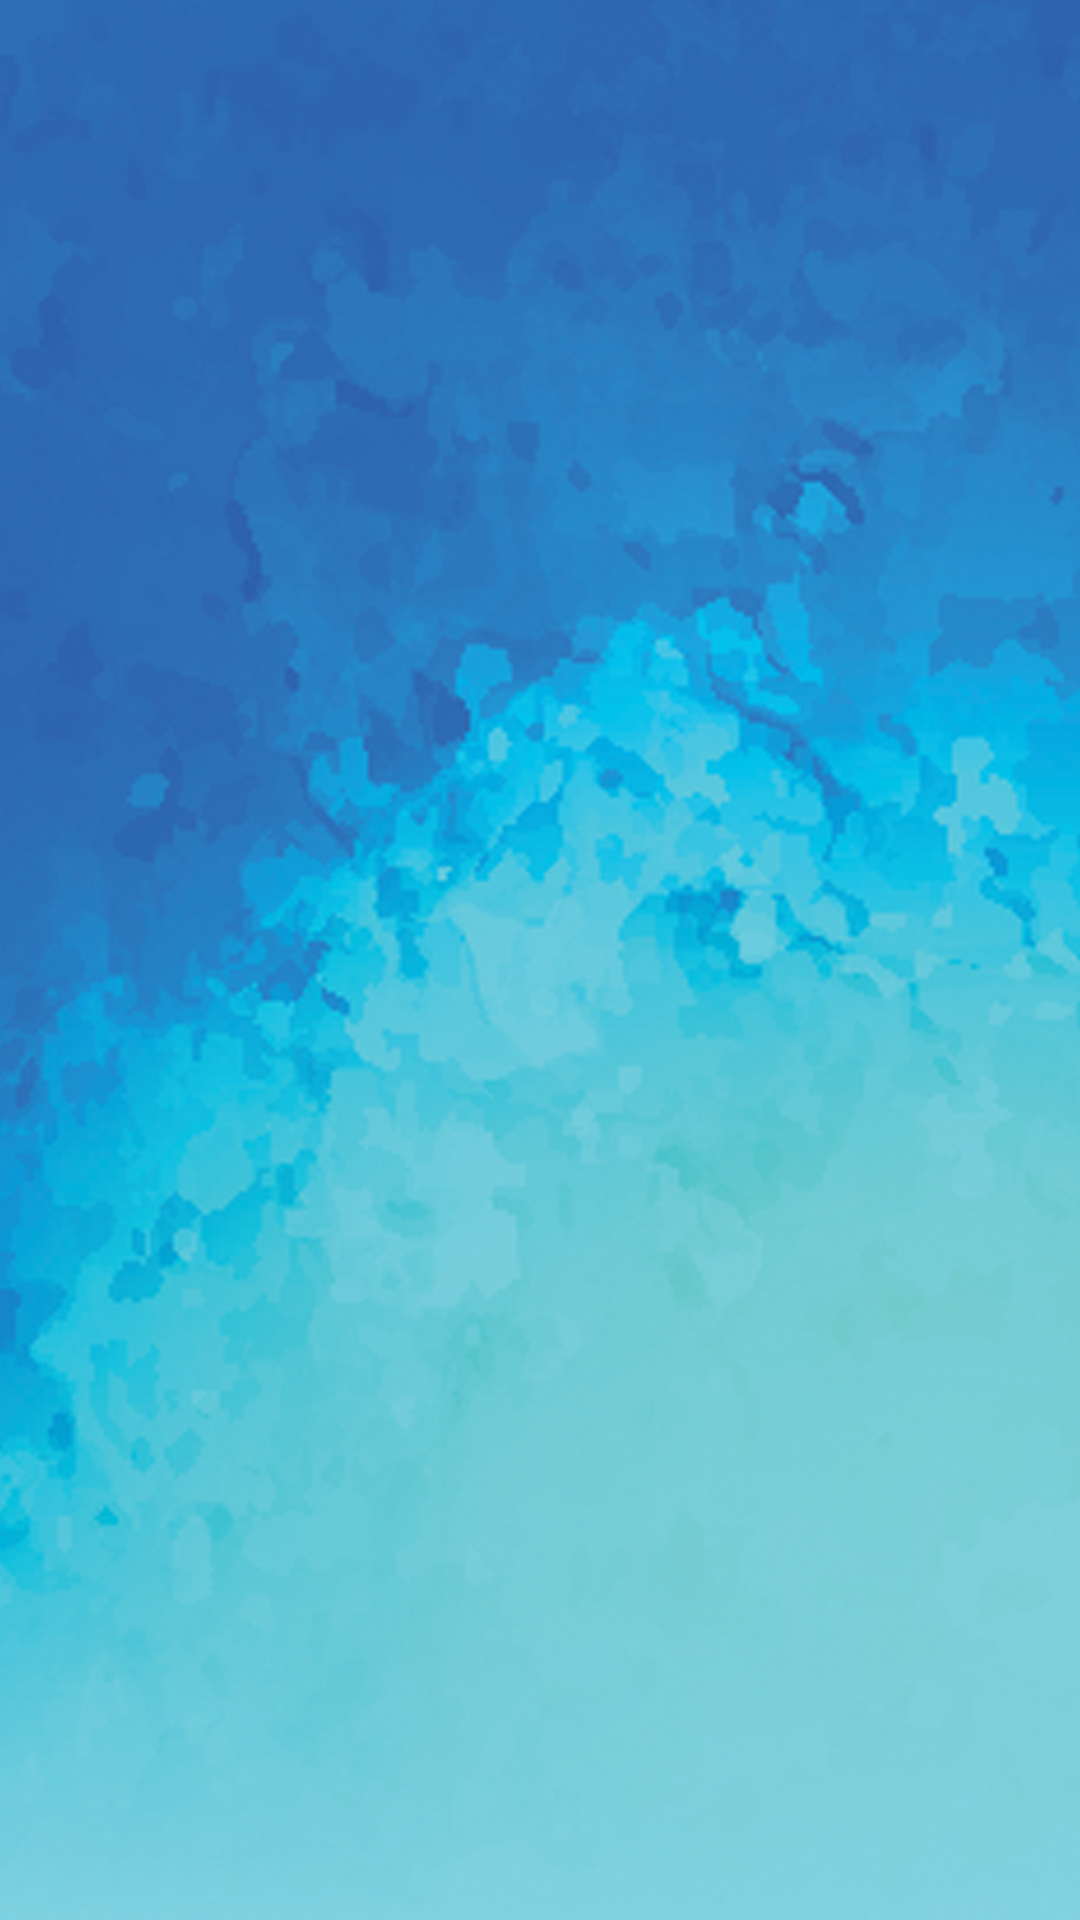 Cute Blue Background Watercolor Wallpaper Iphone Blue Watercolor Watercolor Wallpaper